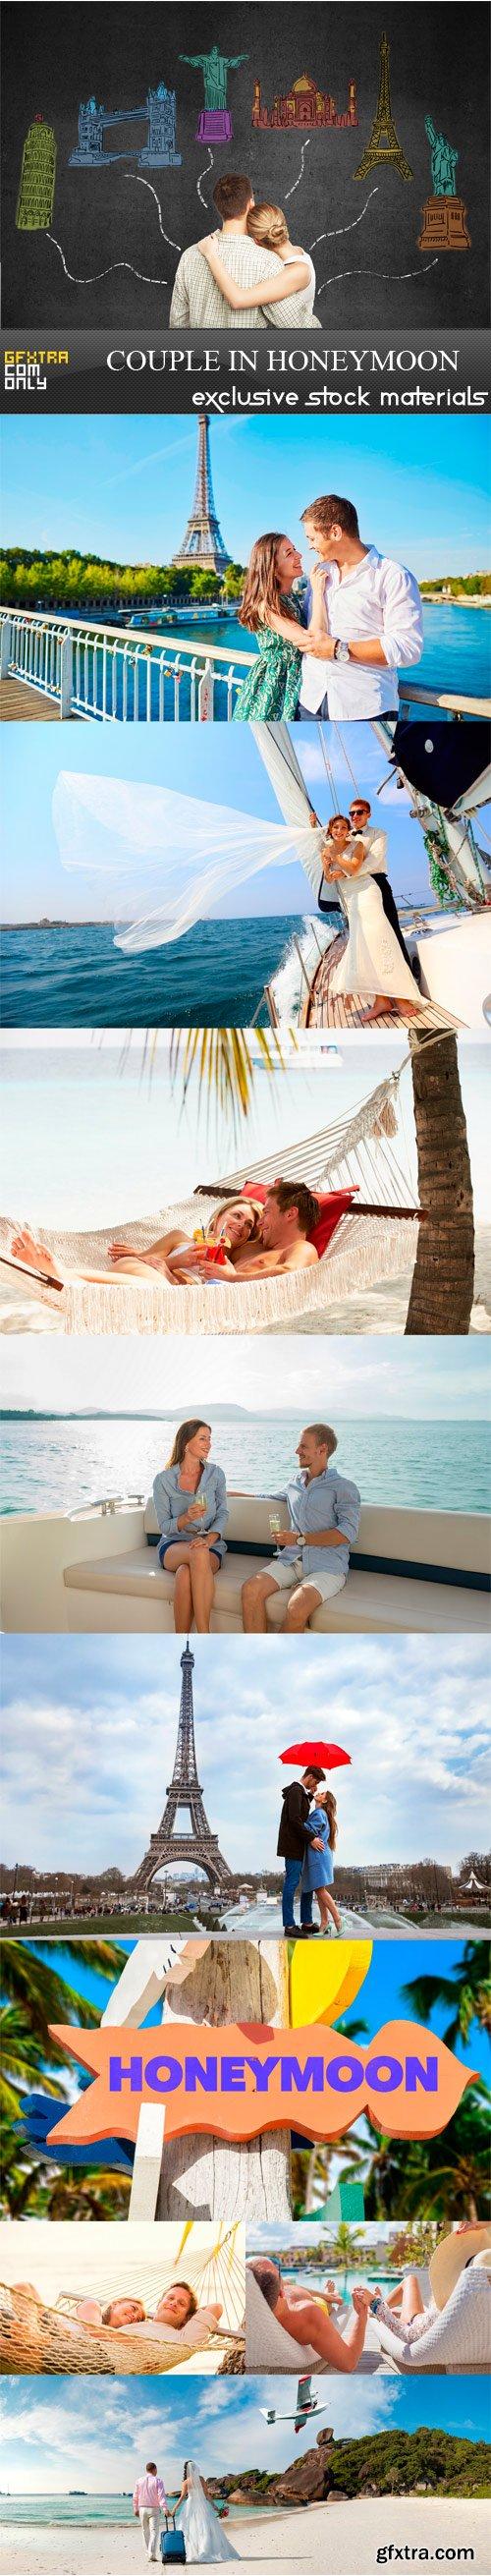 Couple in honeymoon